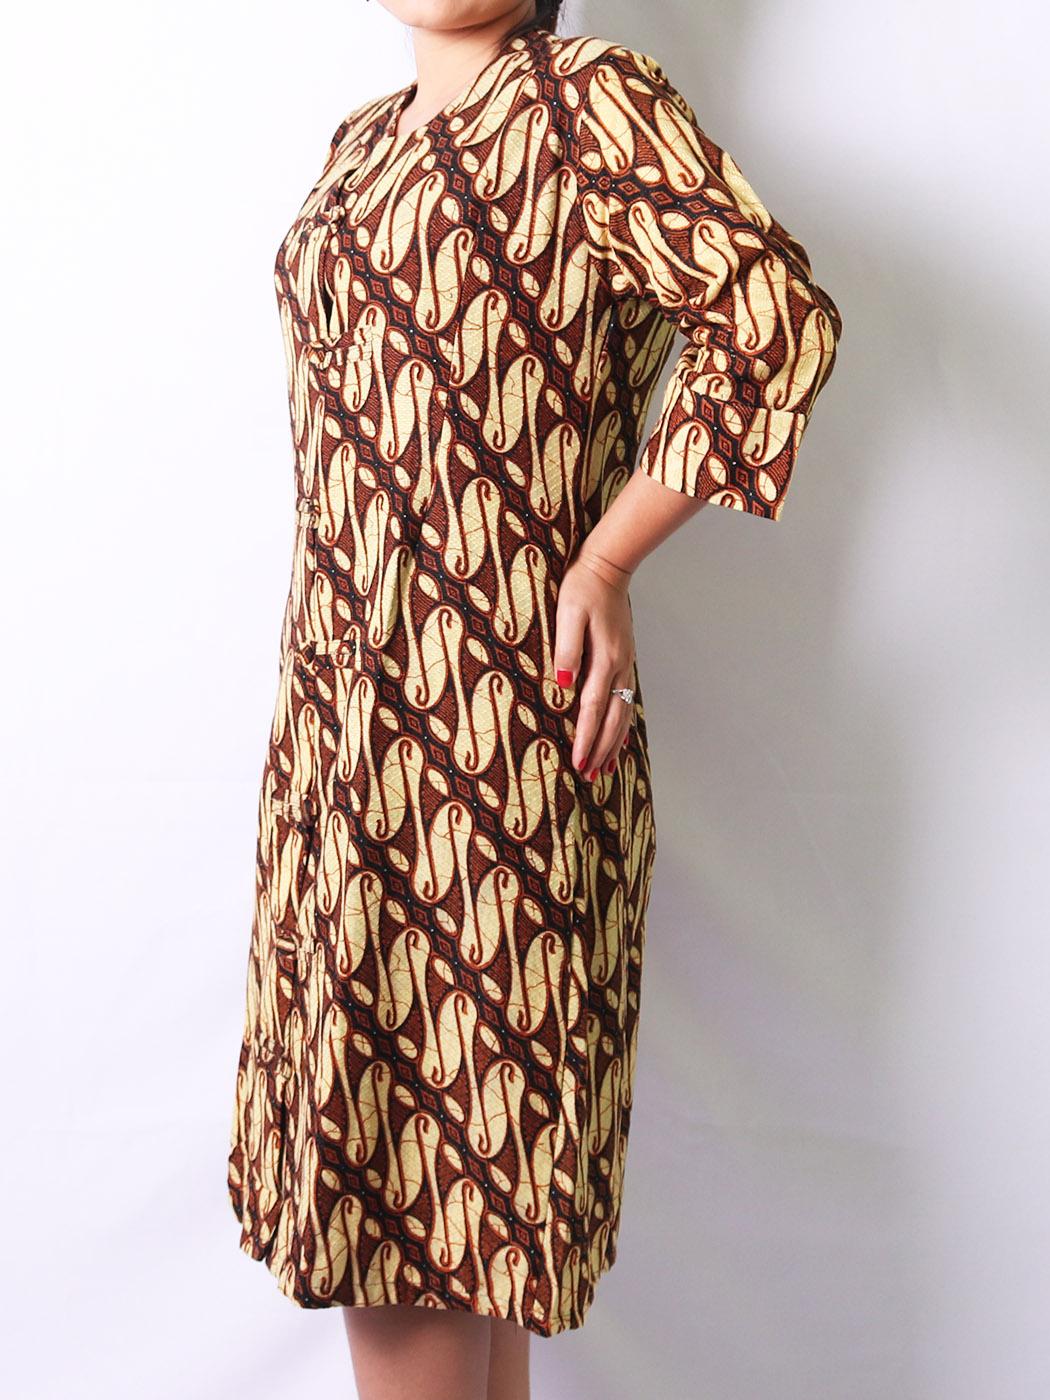 Minidress batik motif parang